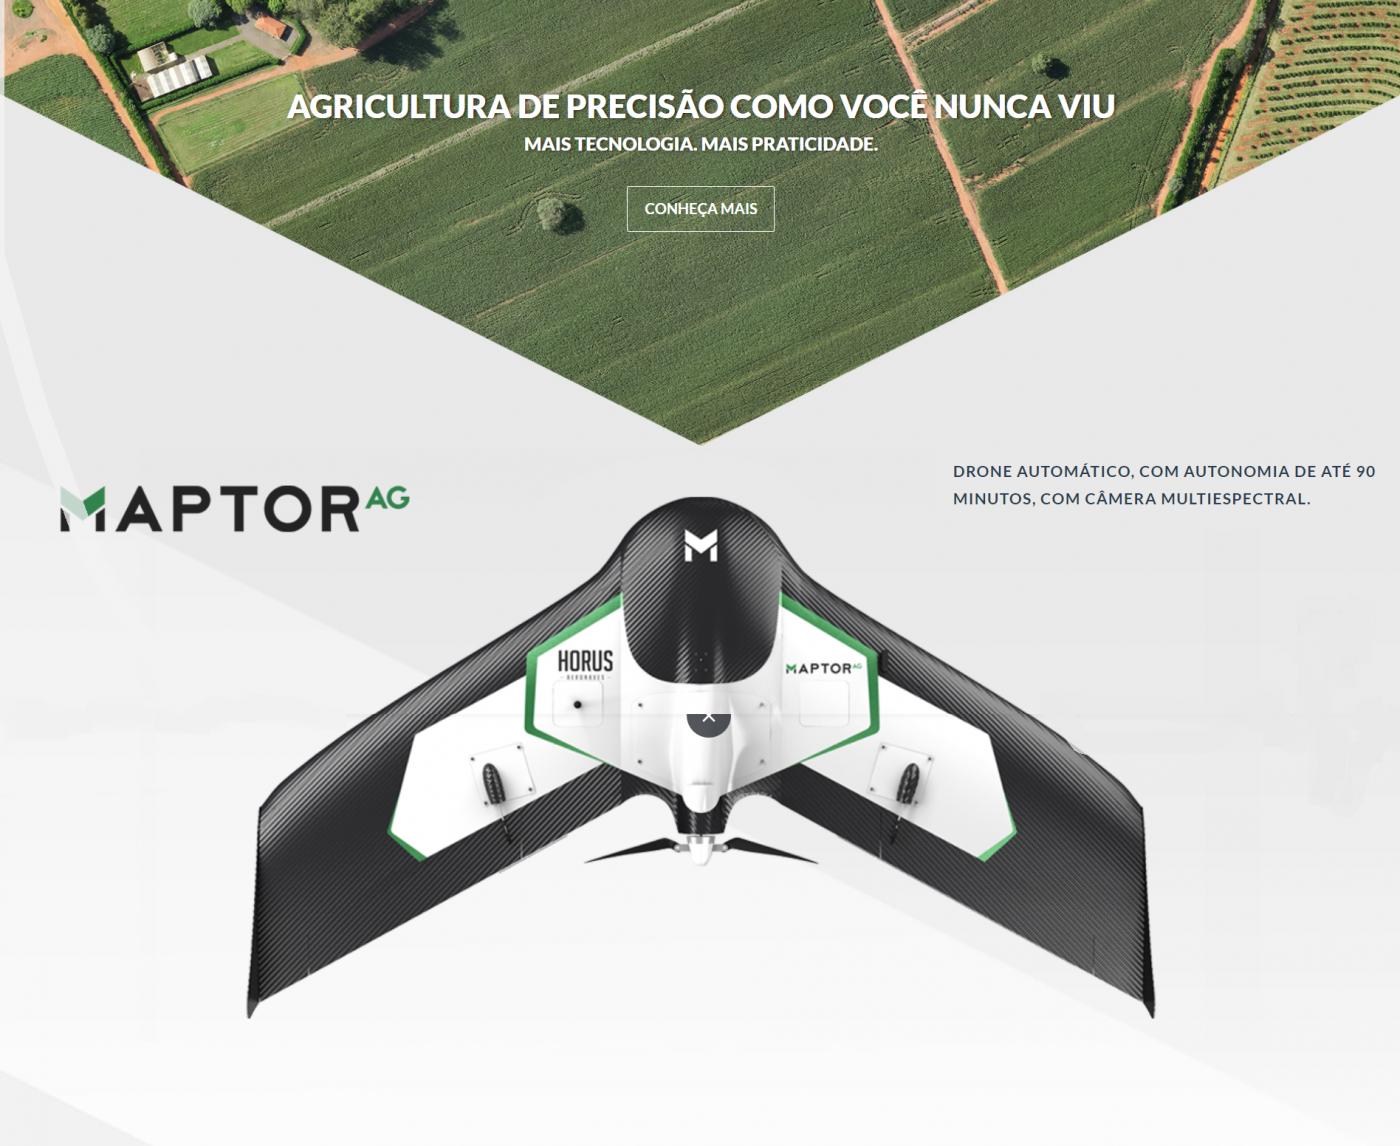 MAPTOR AG, MAPTOR DRONE, DRONE ASA FIXA, ASA FIXA MAPTOR AG,